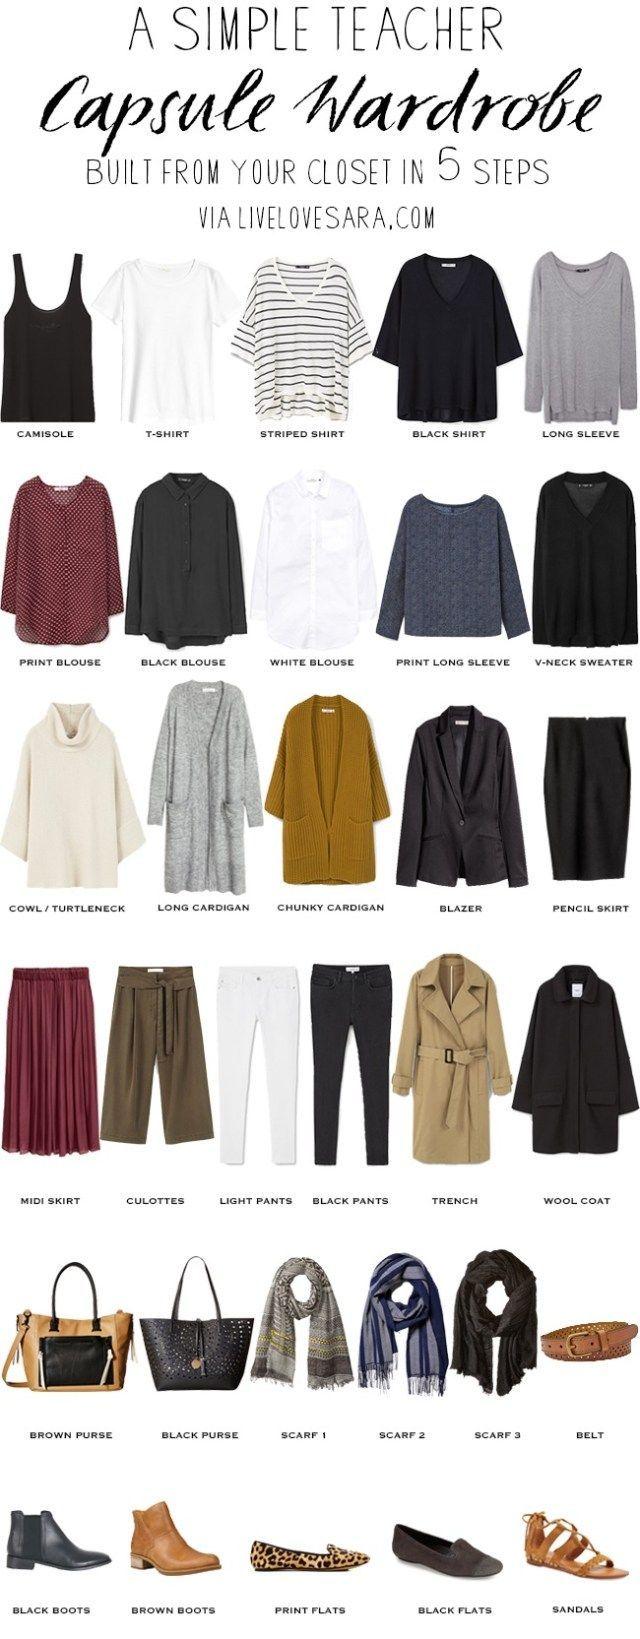 Minimalist Classroom Jobs : Best capsule wardrobe neutral ideas on pinterest